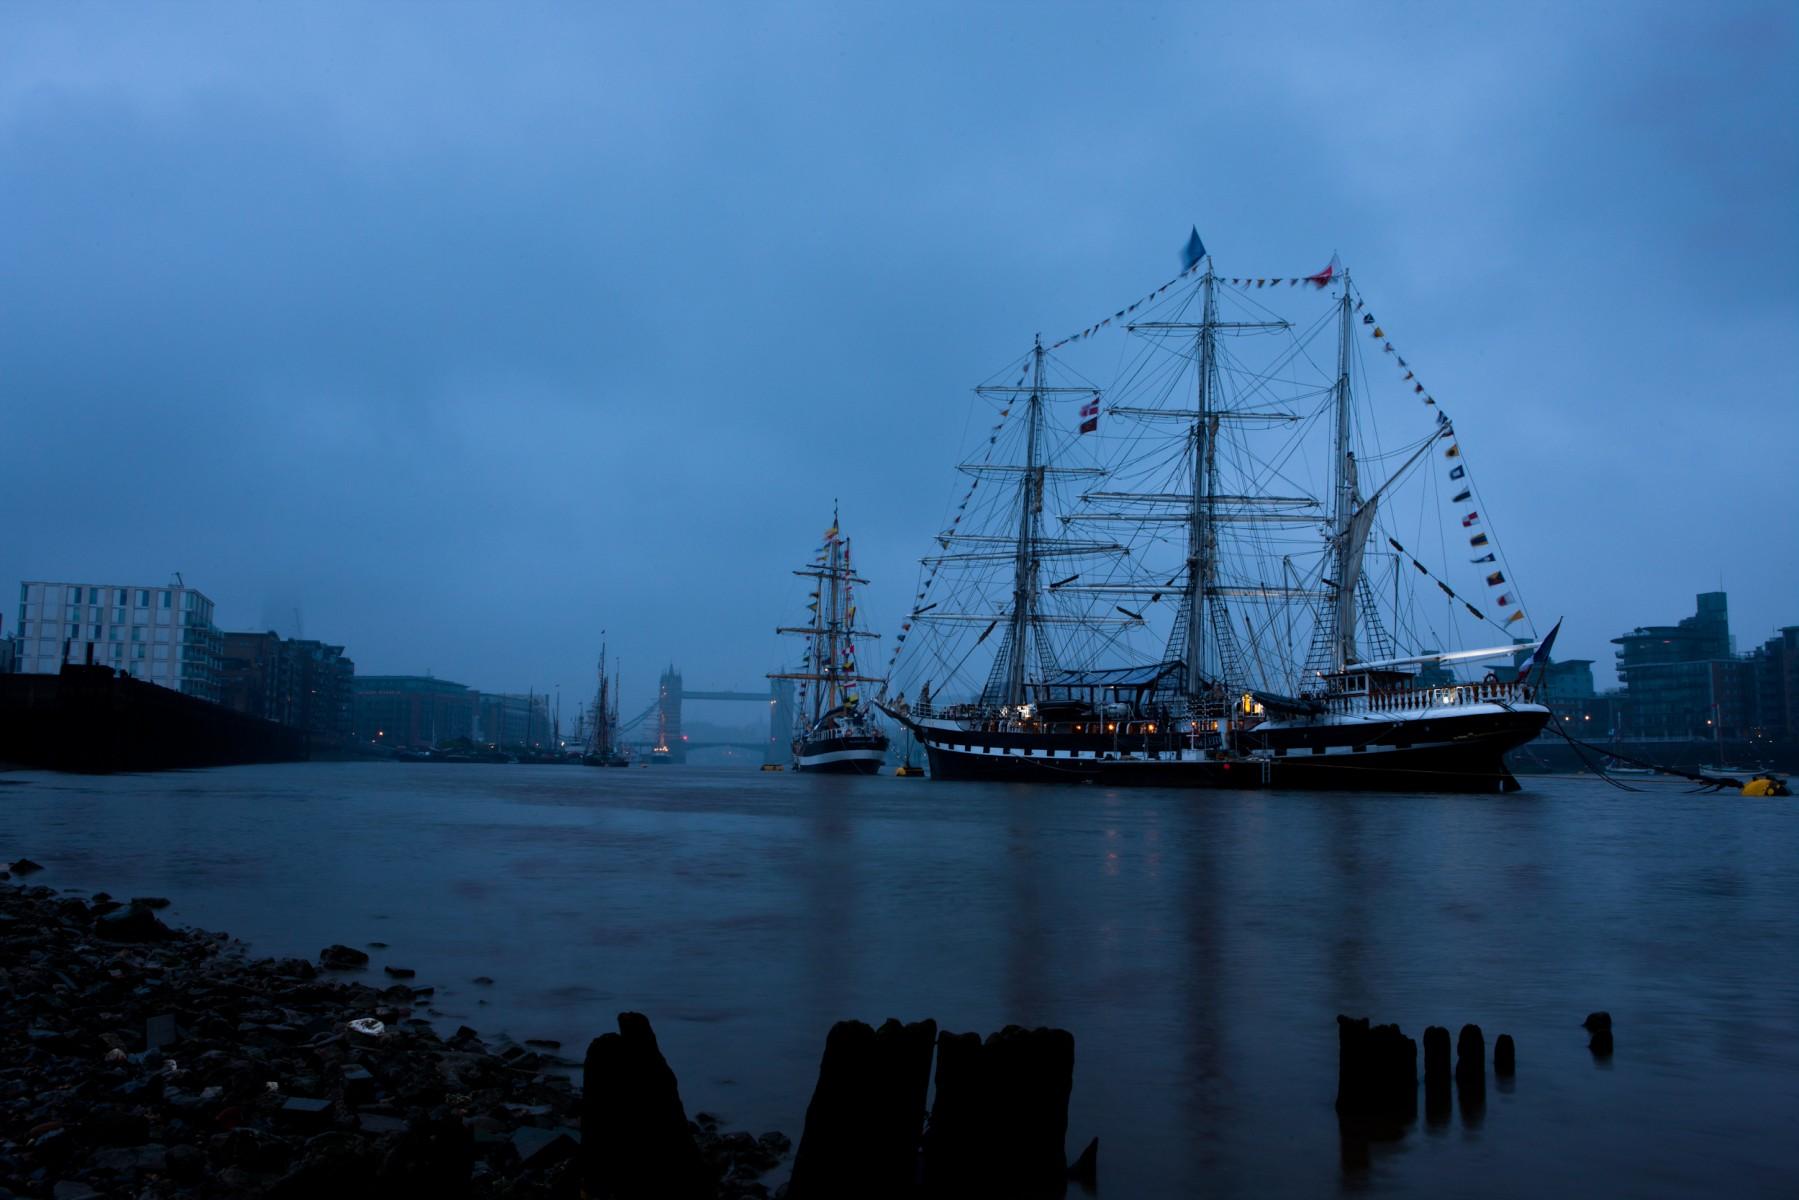 Pelican and Belem moored just west of Tower Bridge